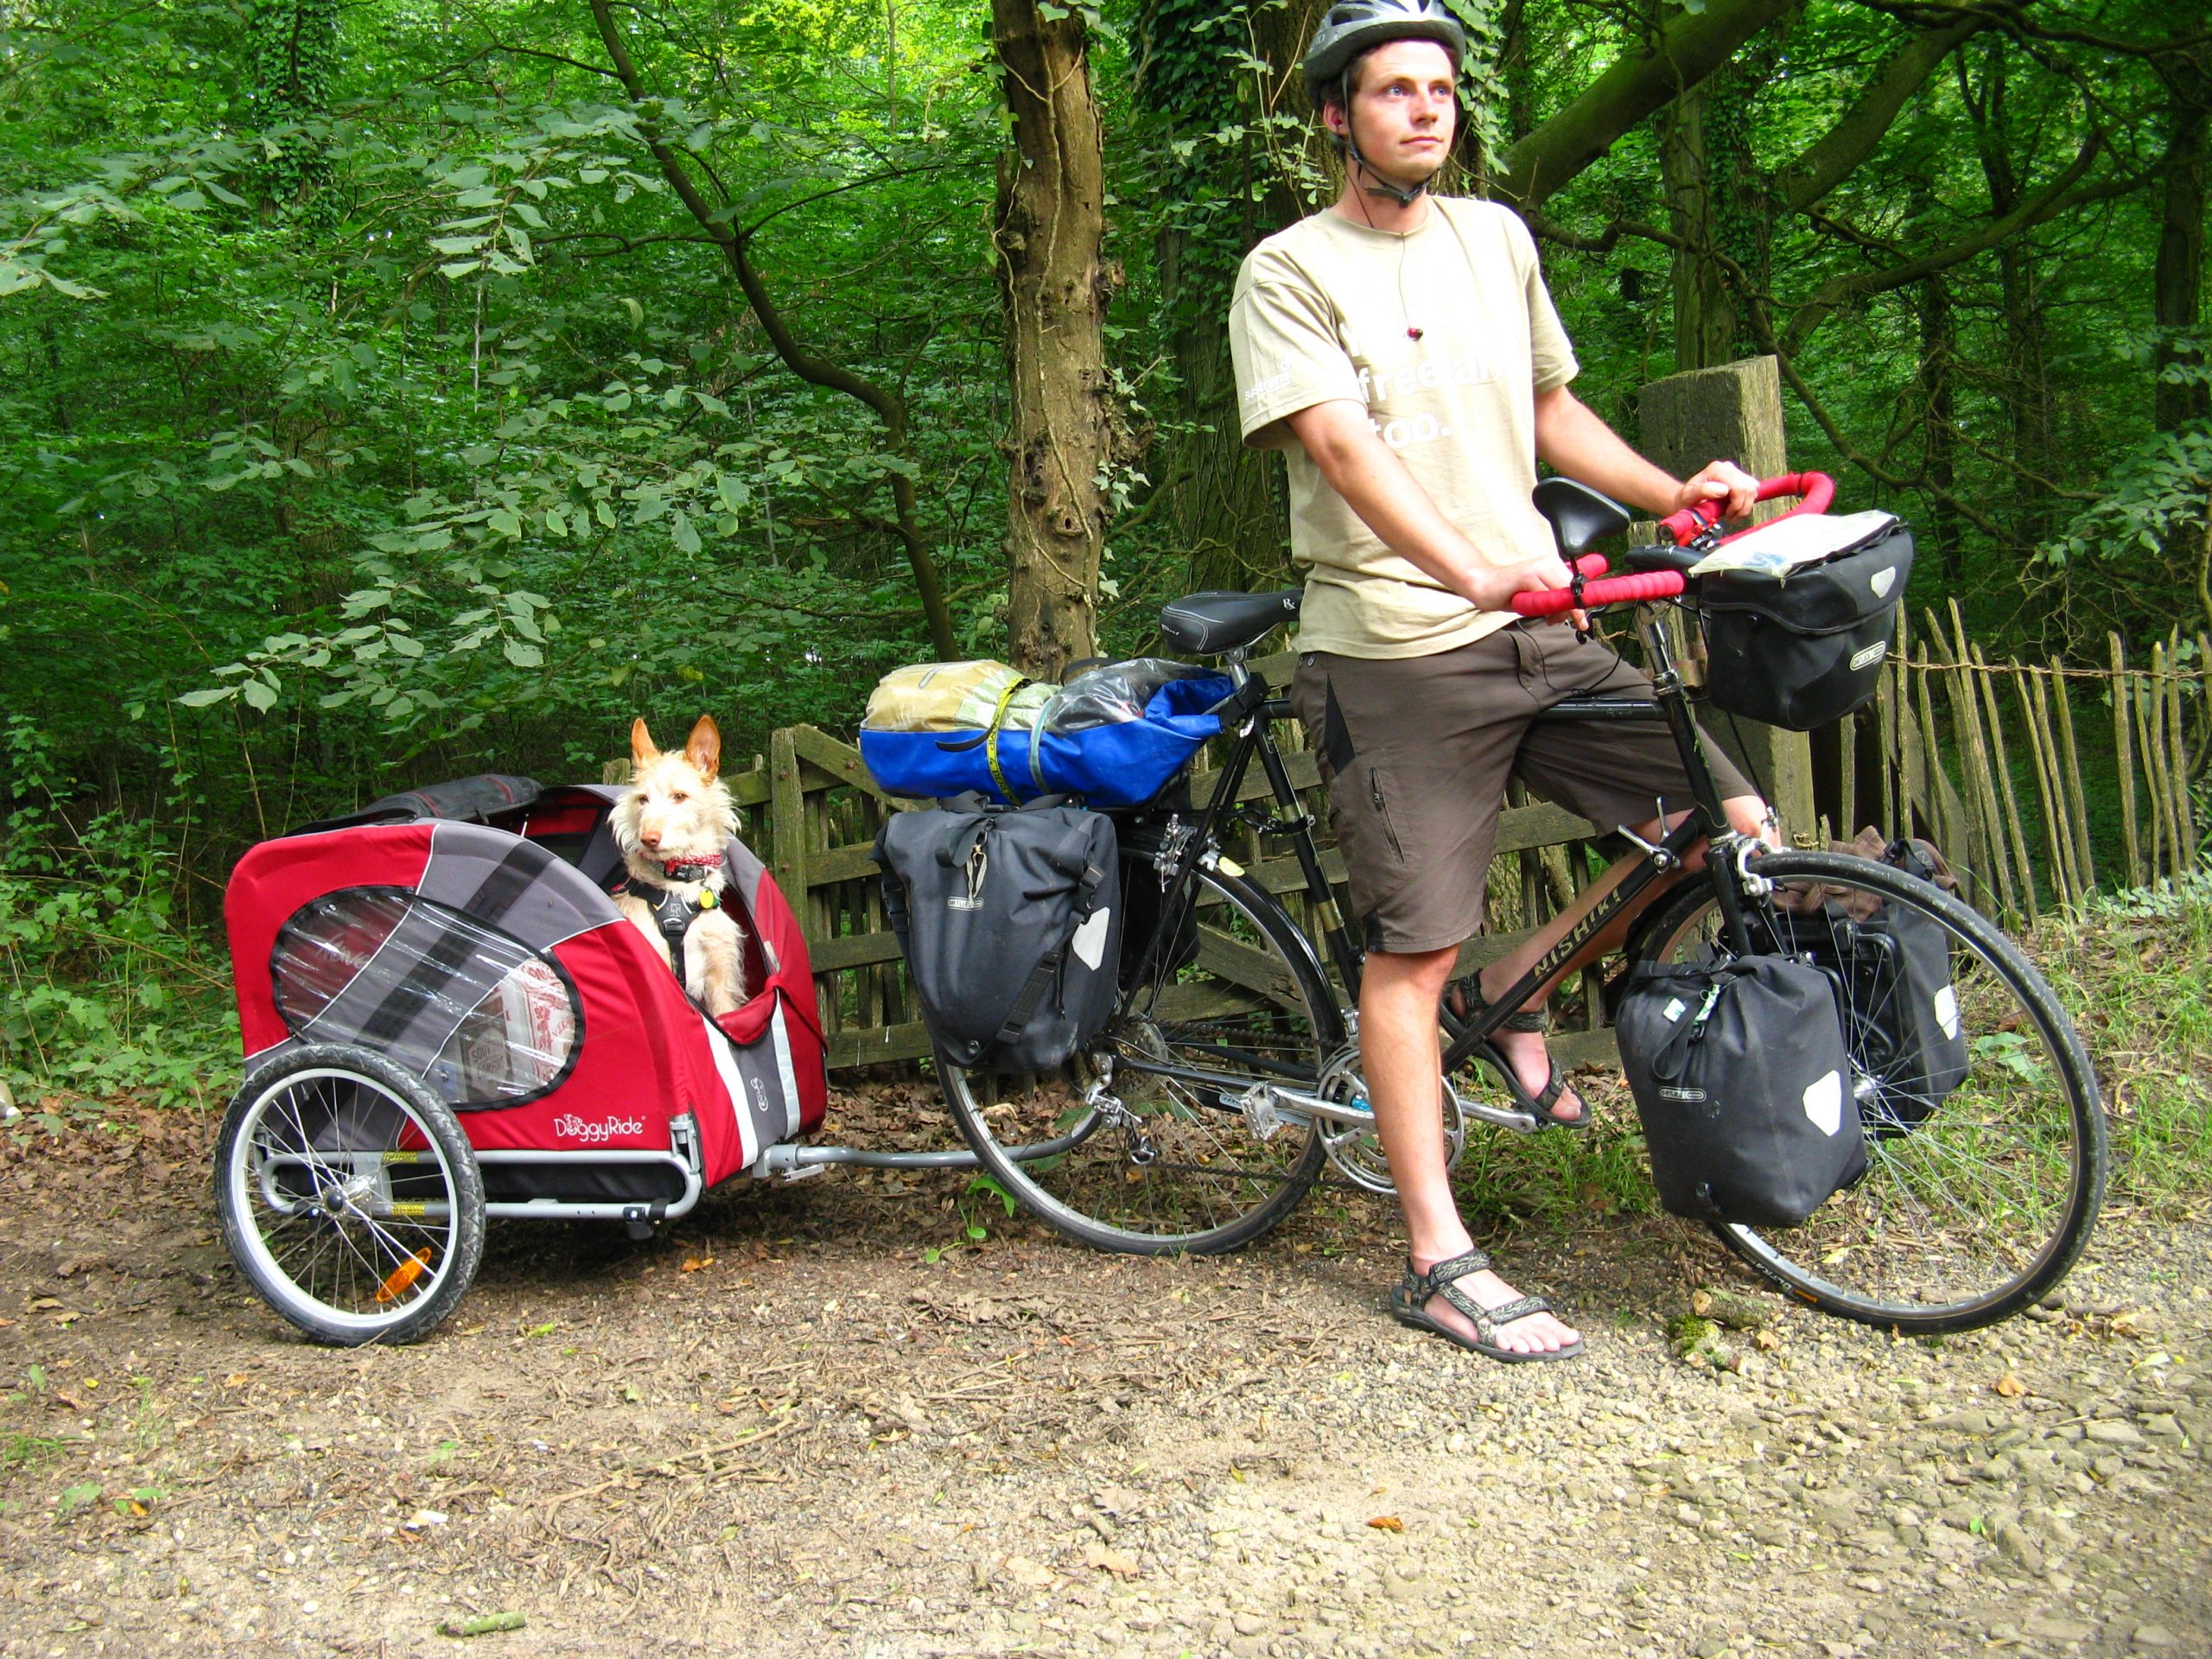 Springer Dog Bike Uk